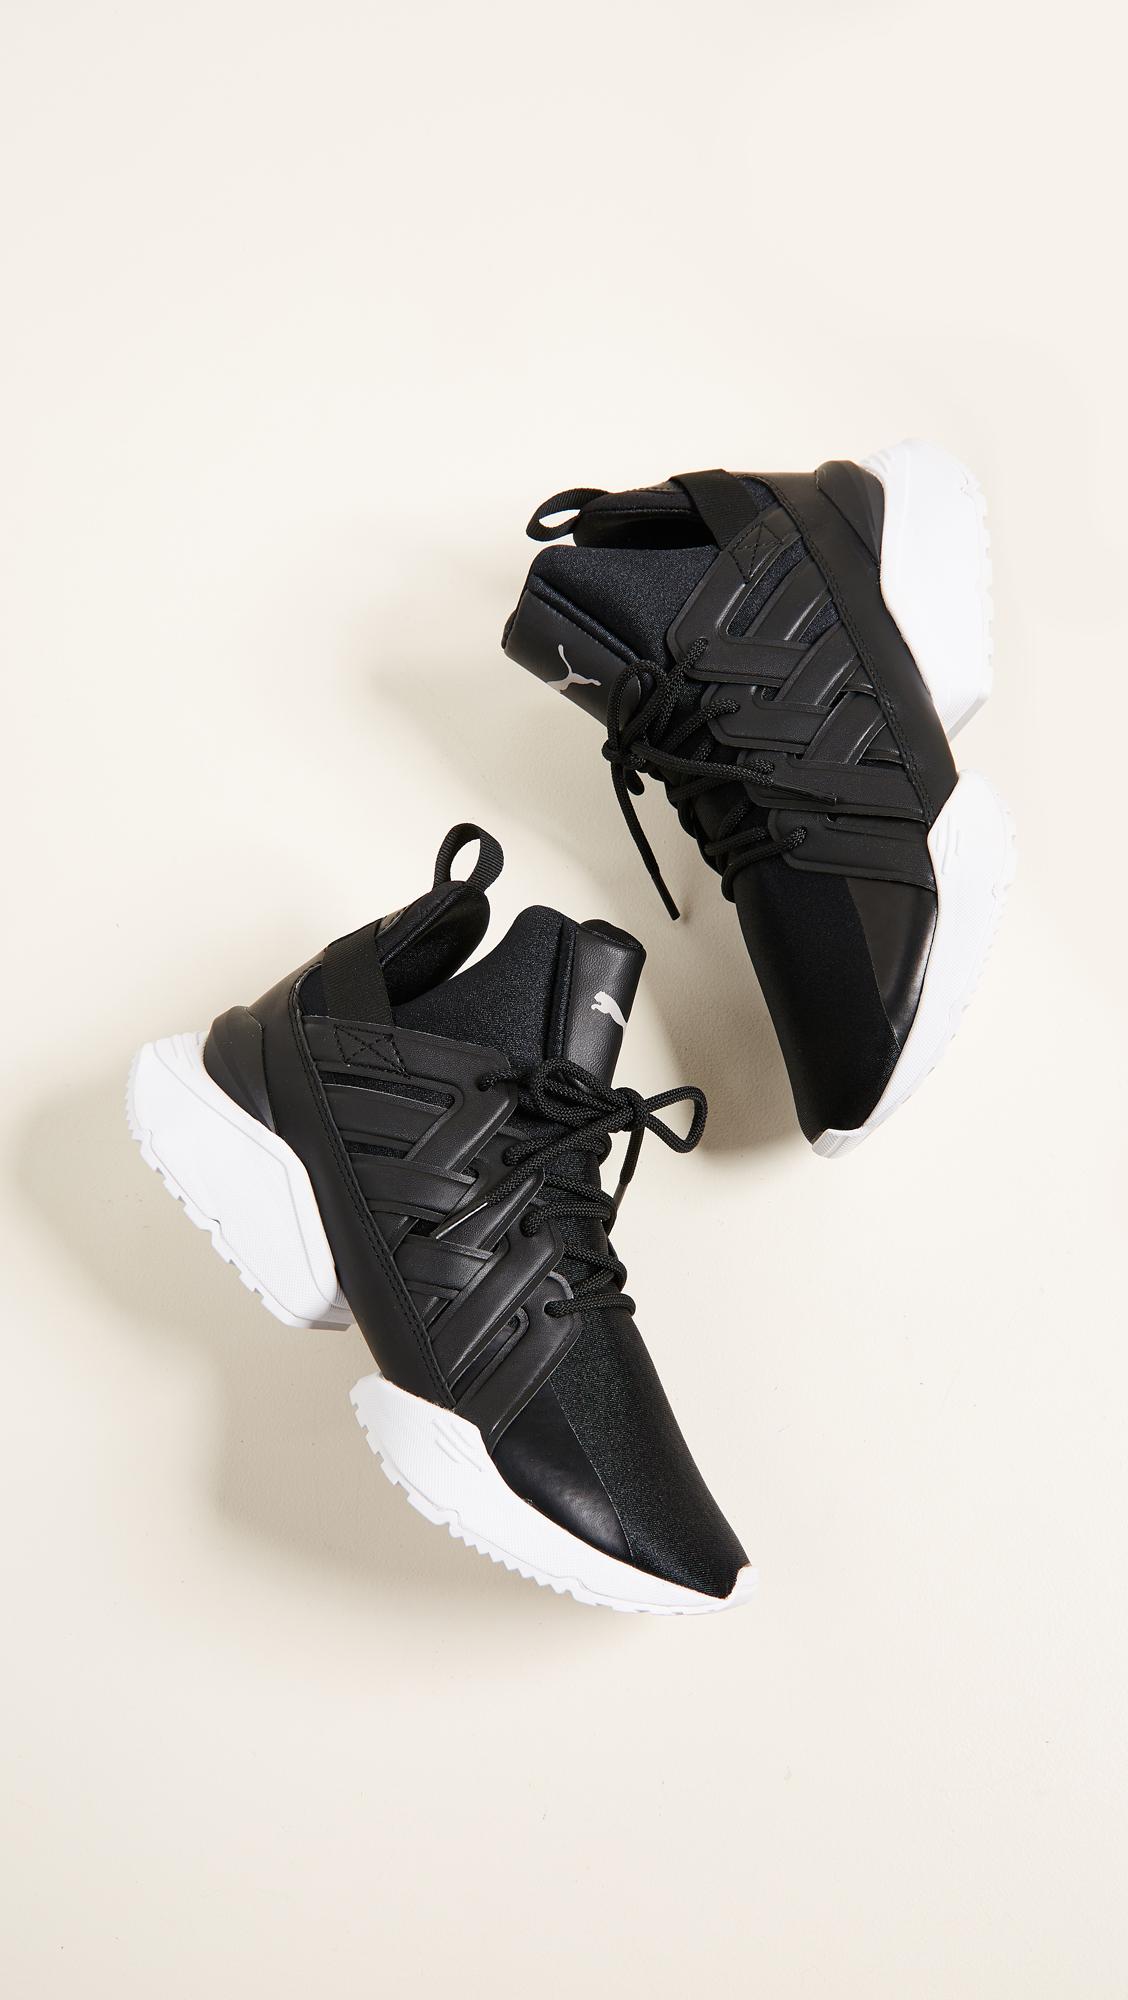 453035fea6de PUMA Muse Echo Satin EP Sneakers